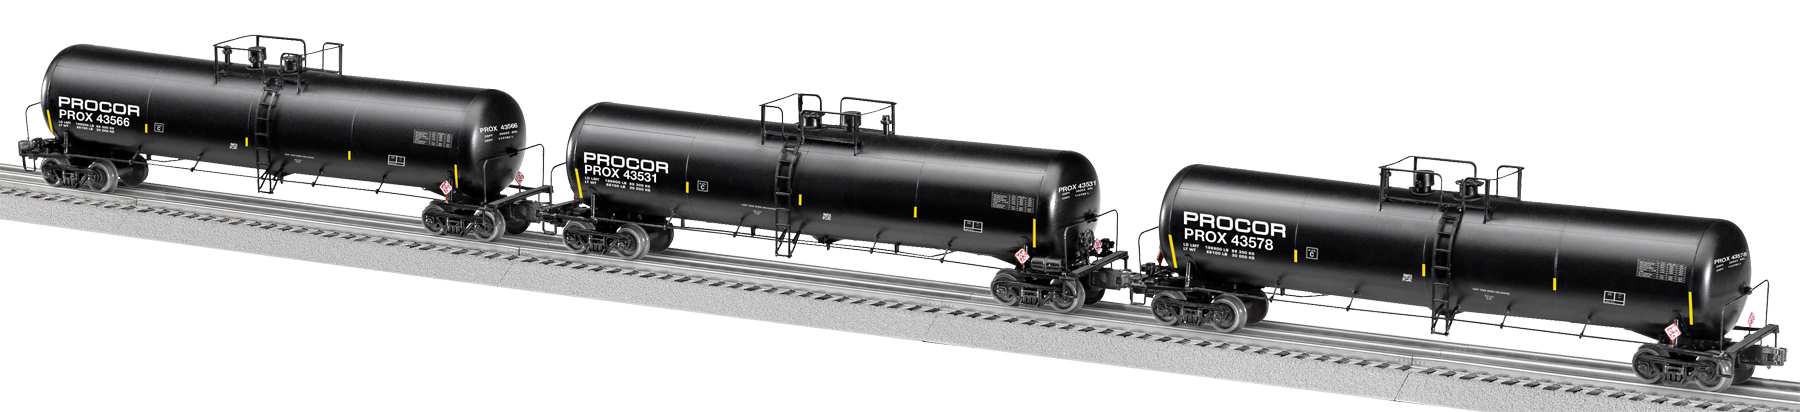 Procor Scale 30k Gallon Ethanol Tank Car 3 Pack